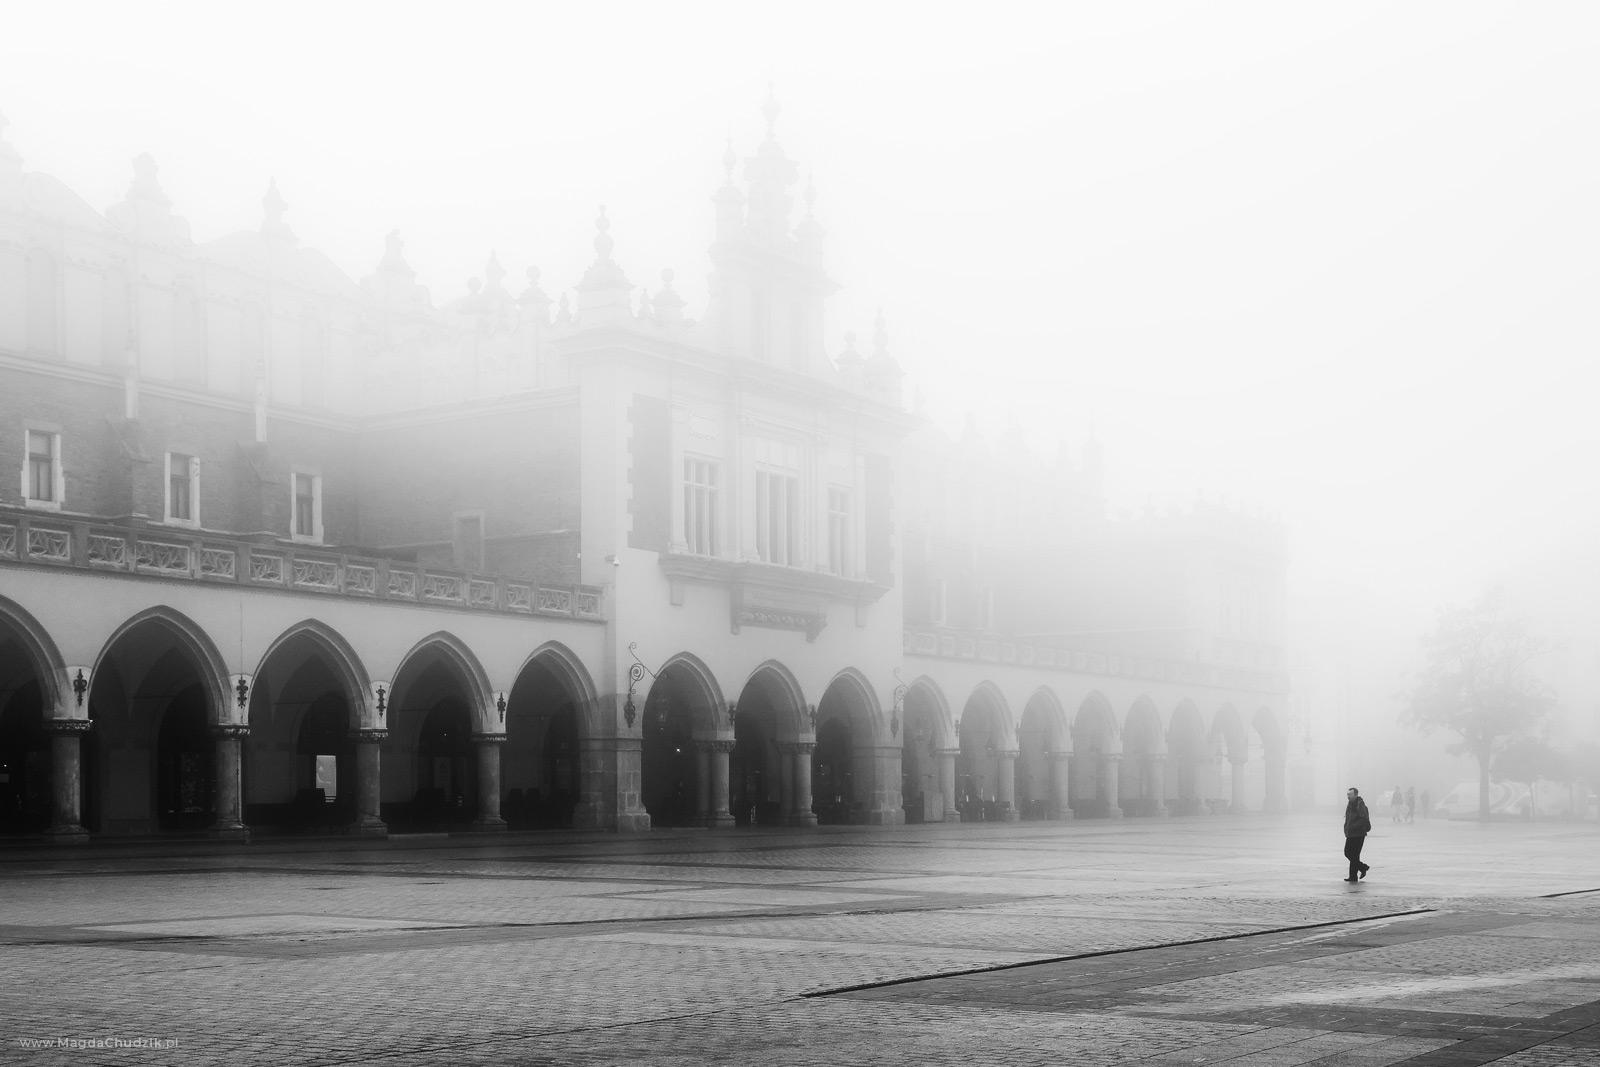 magda-chudzik-street-photography-poland-krakow-077